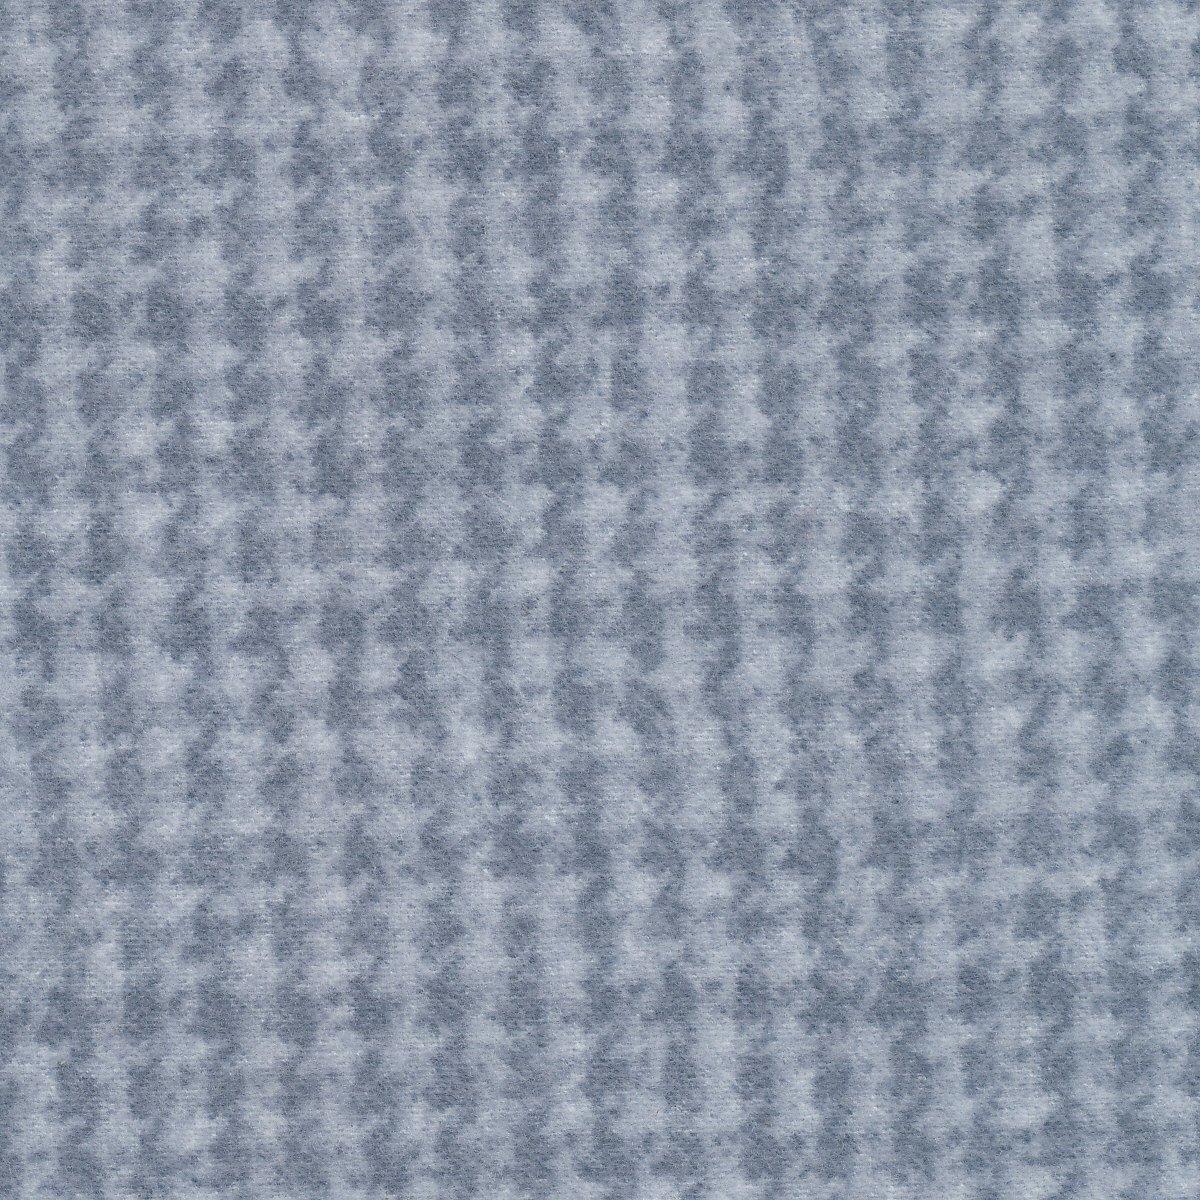 Woolies Flannel - MASF18503-B